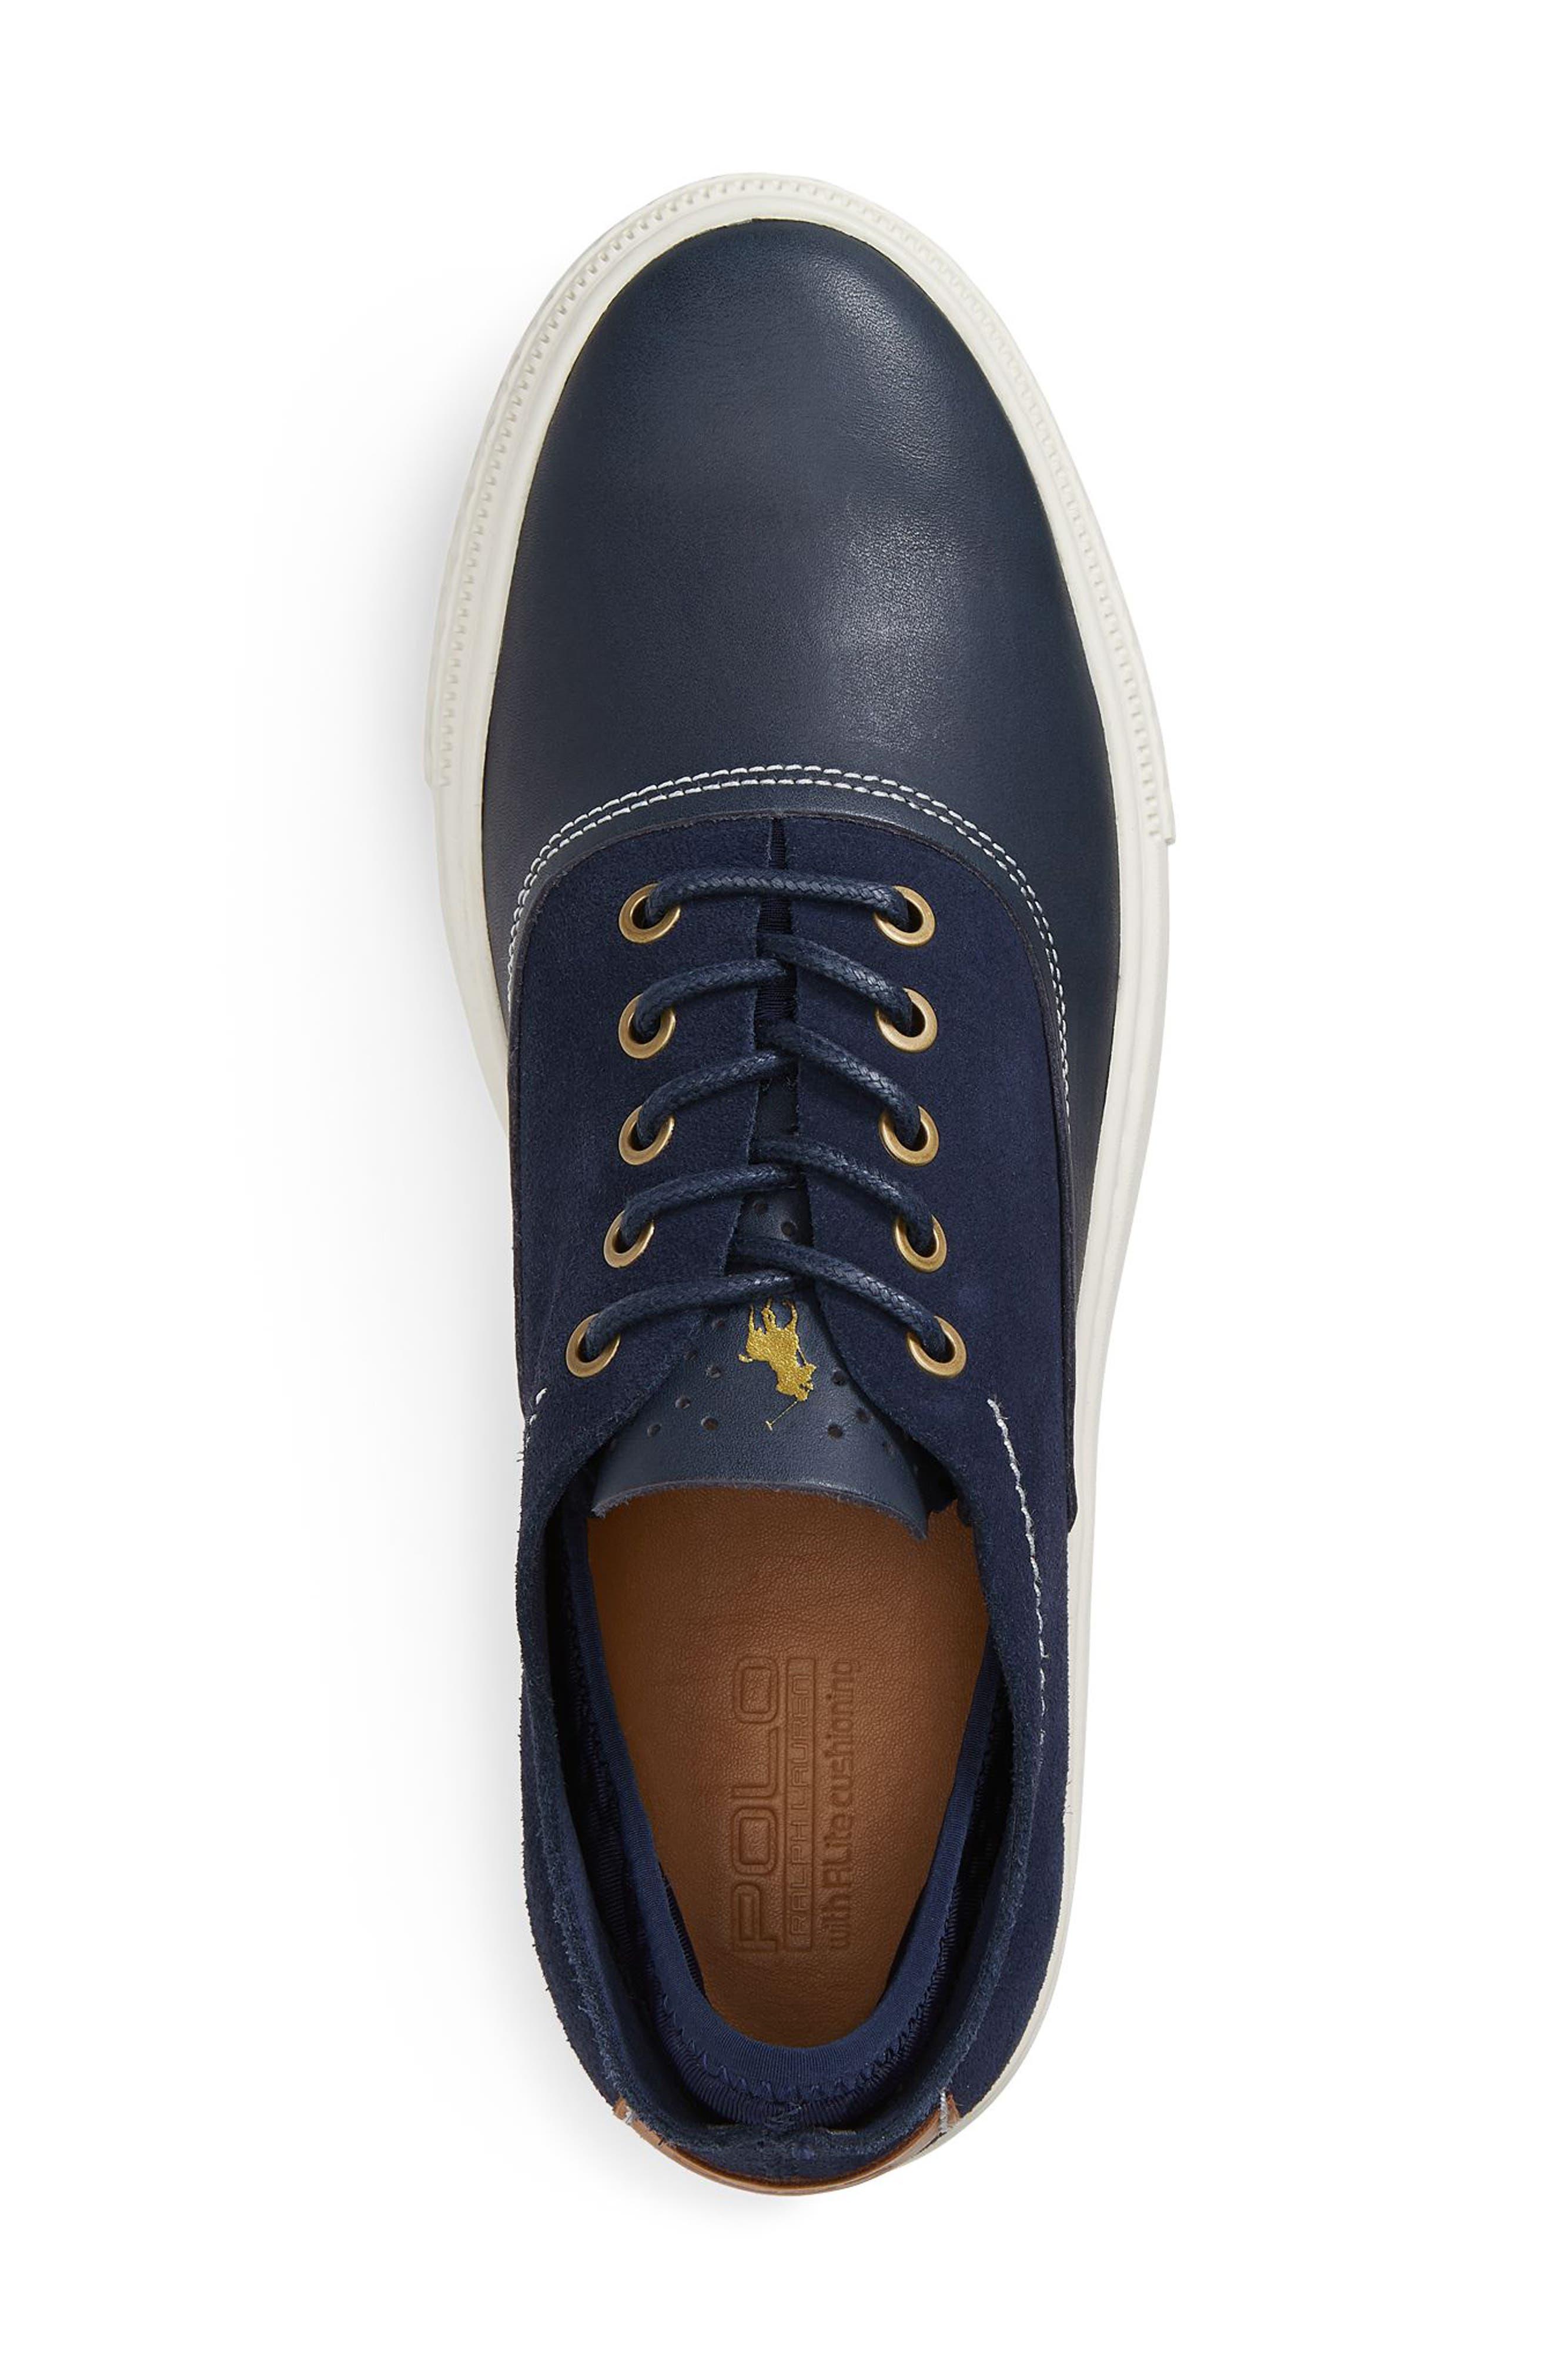 POLO RALPH LAUREN, Thorton 100 Sneaker, Alternate thumbnail 4, color, 410